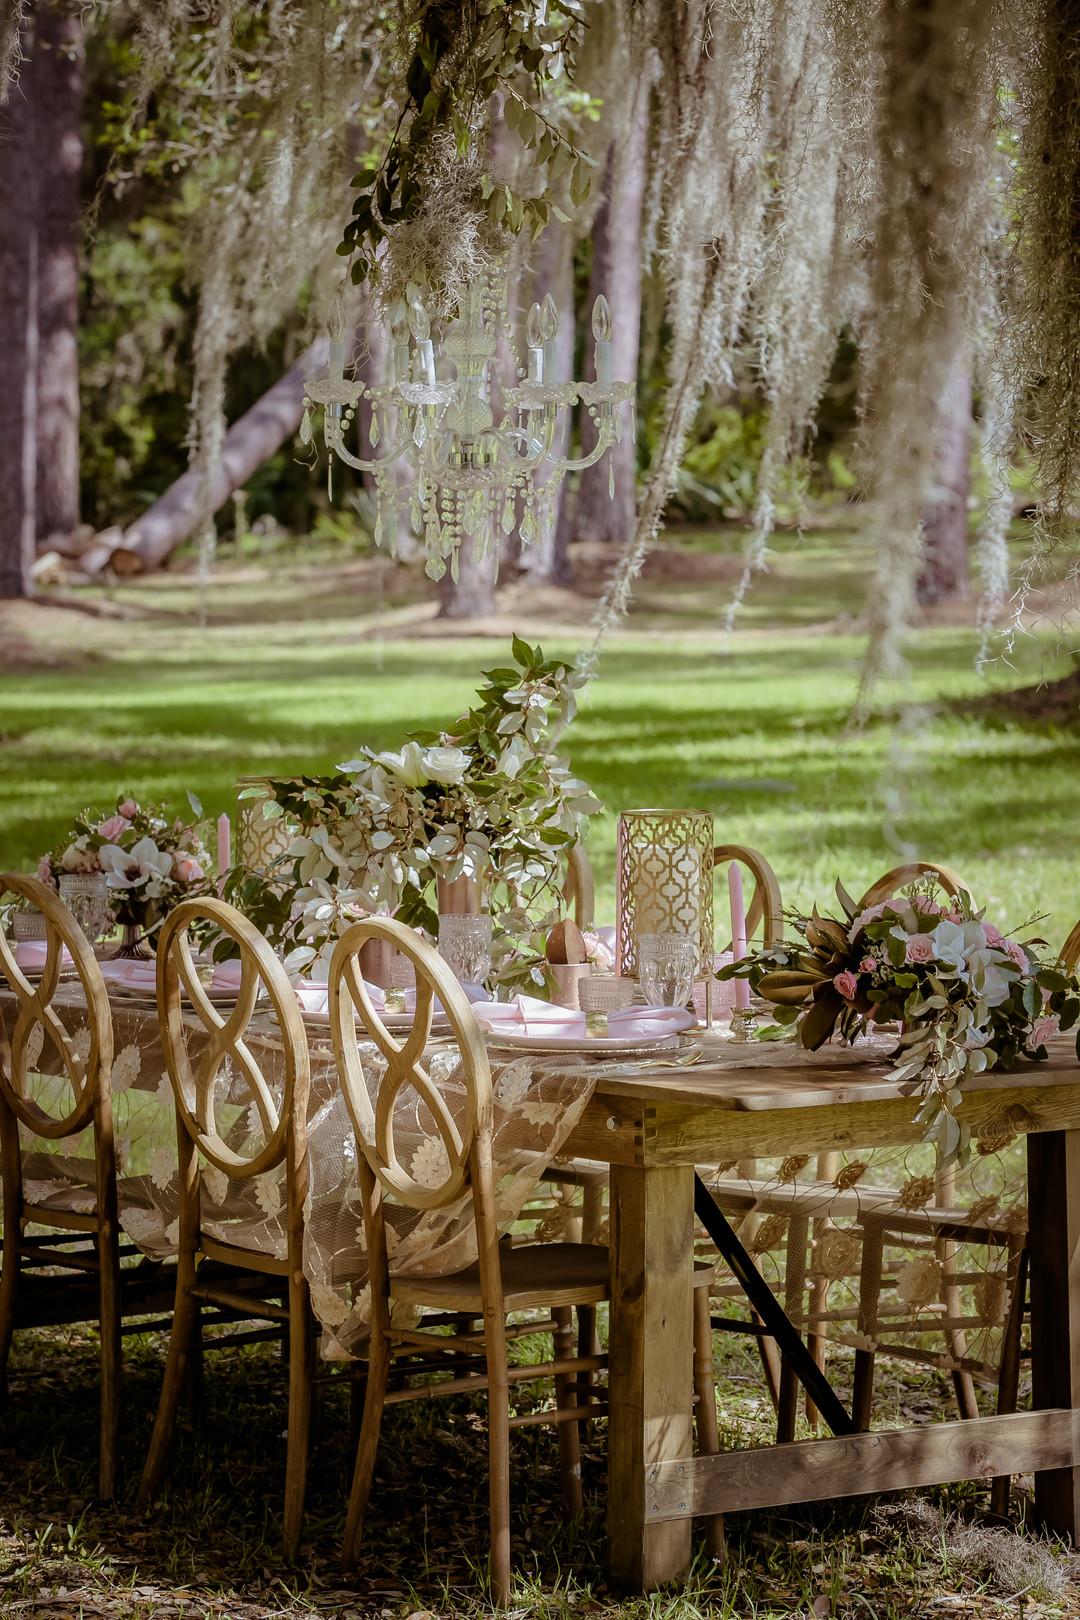 rose-hill-mansion-wedding-15.jpg